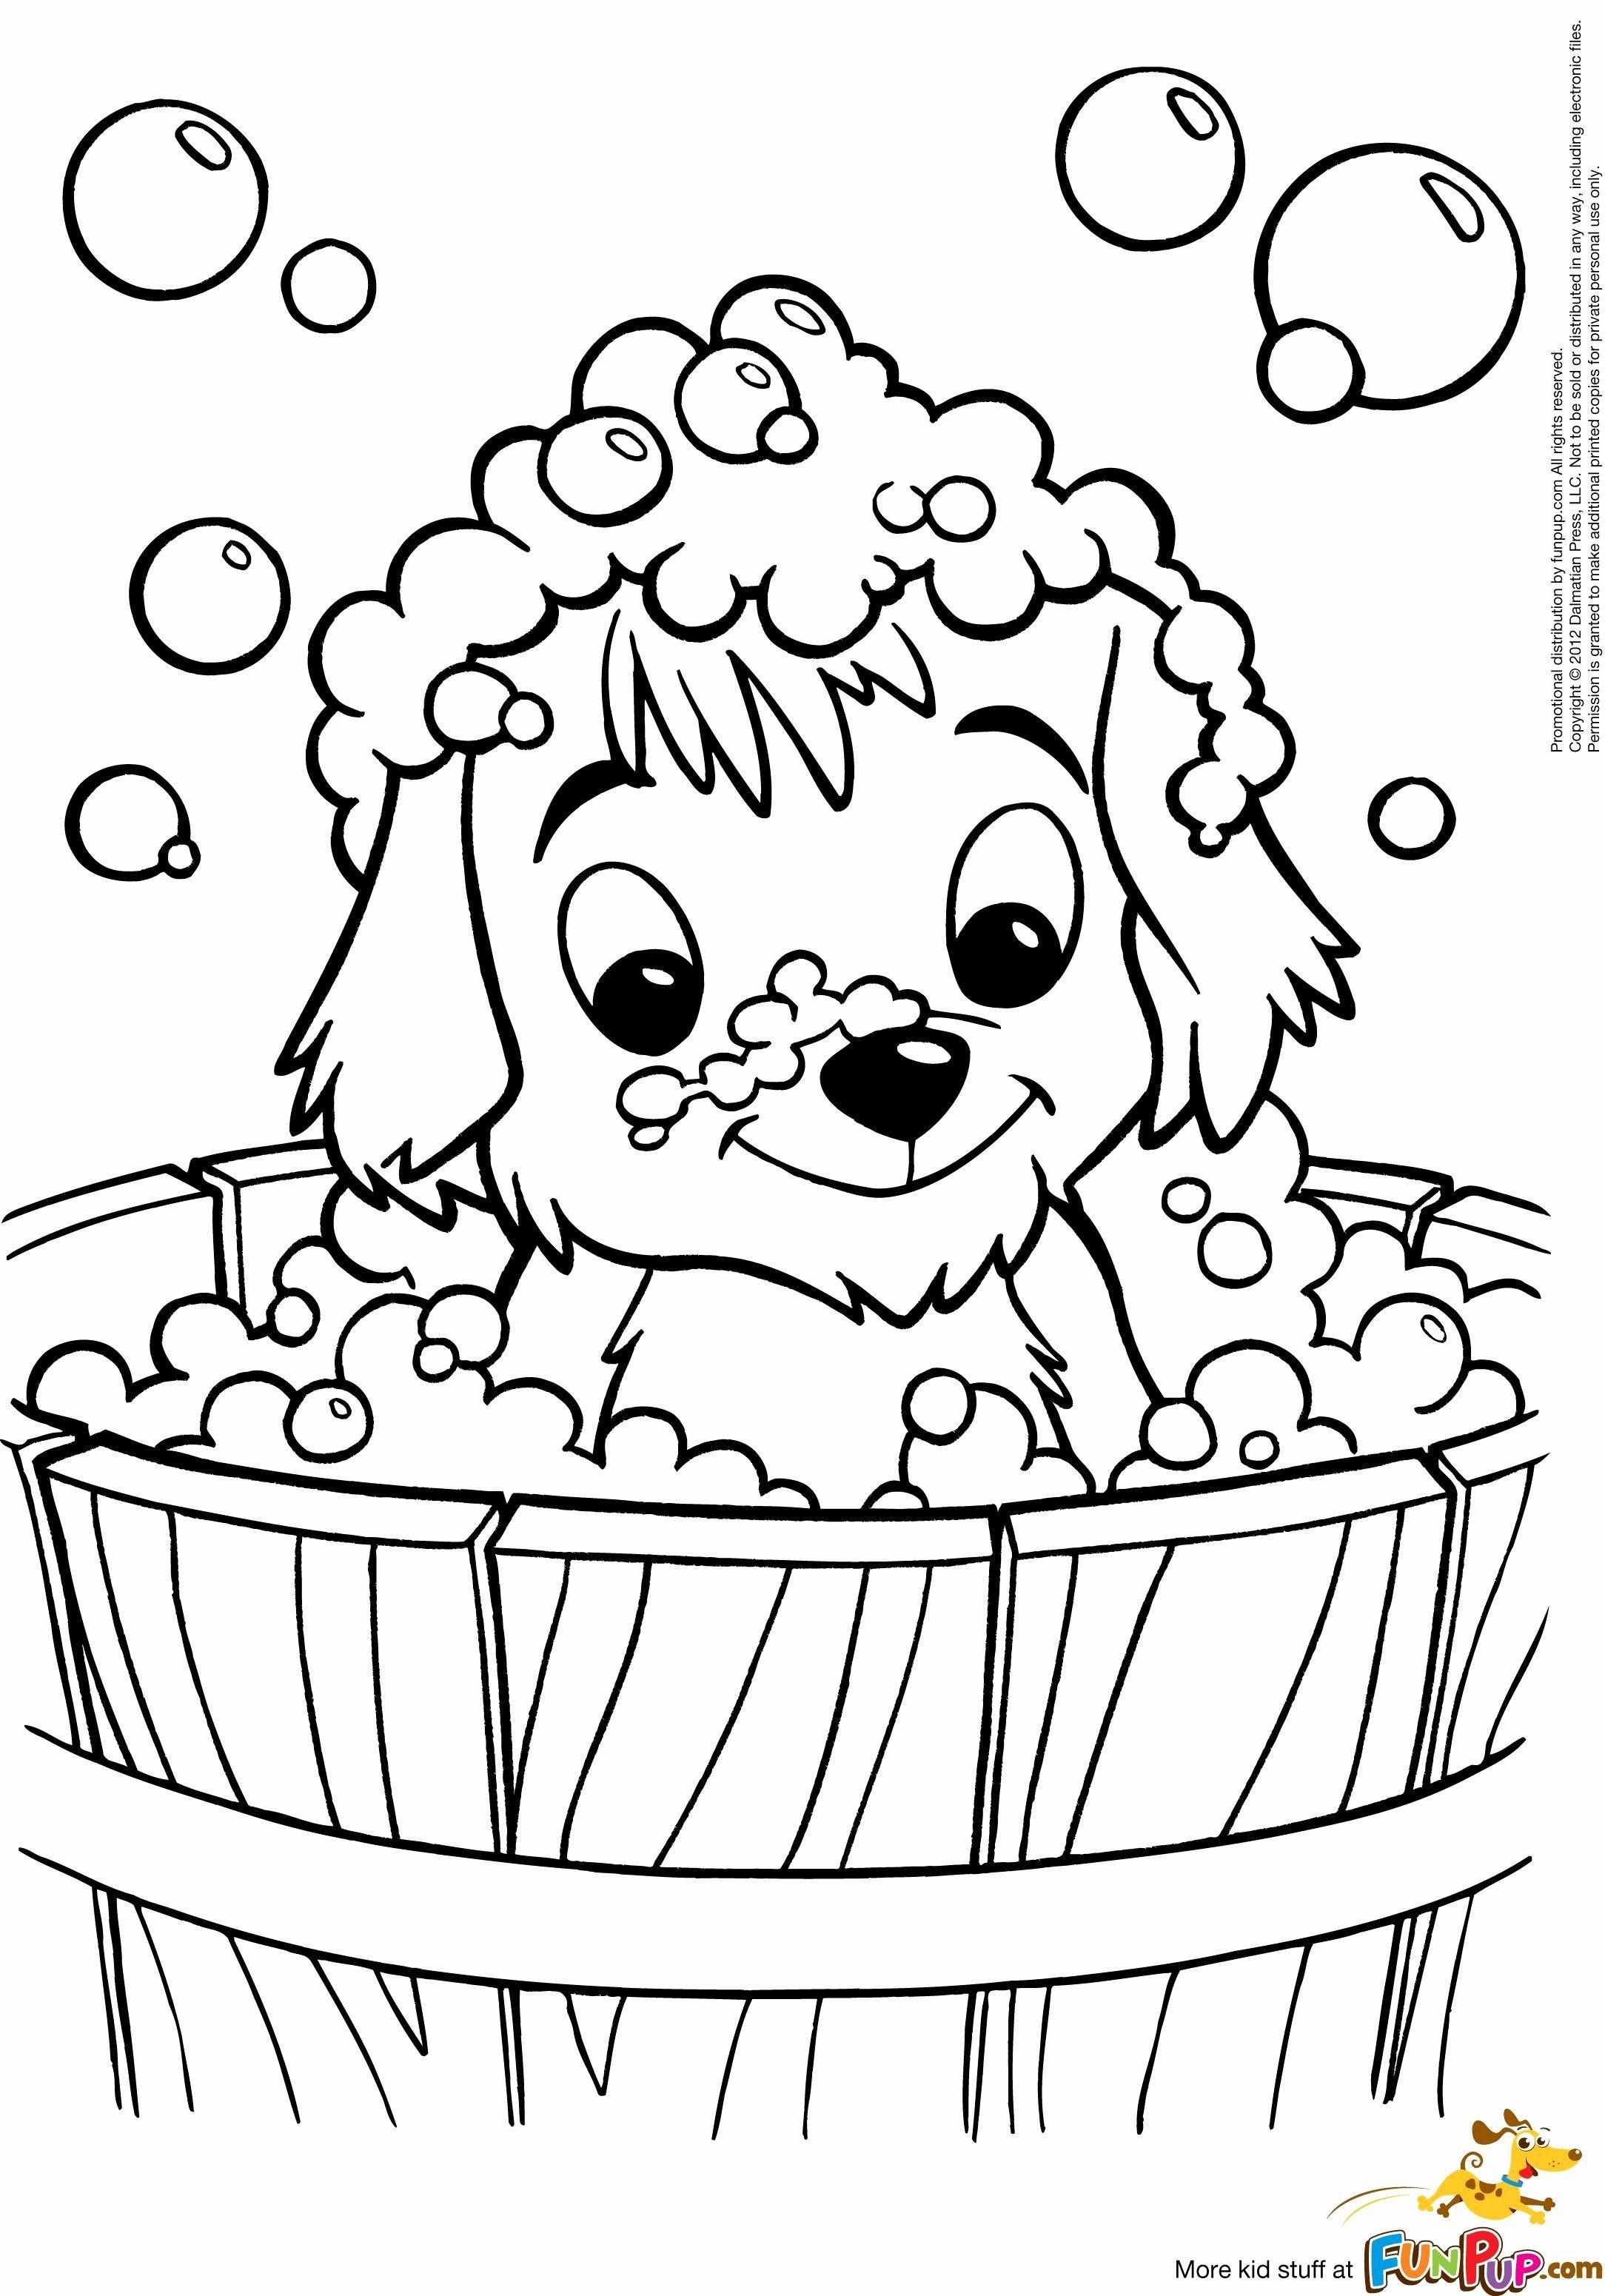 Coloring Cartoon Dog Inspirational Collection Funny Husky Coloring Pages Puppy Coloring Pages Dog Coloring Page Cute Coloring Pages